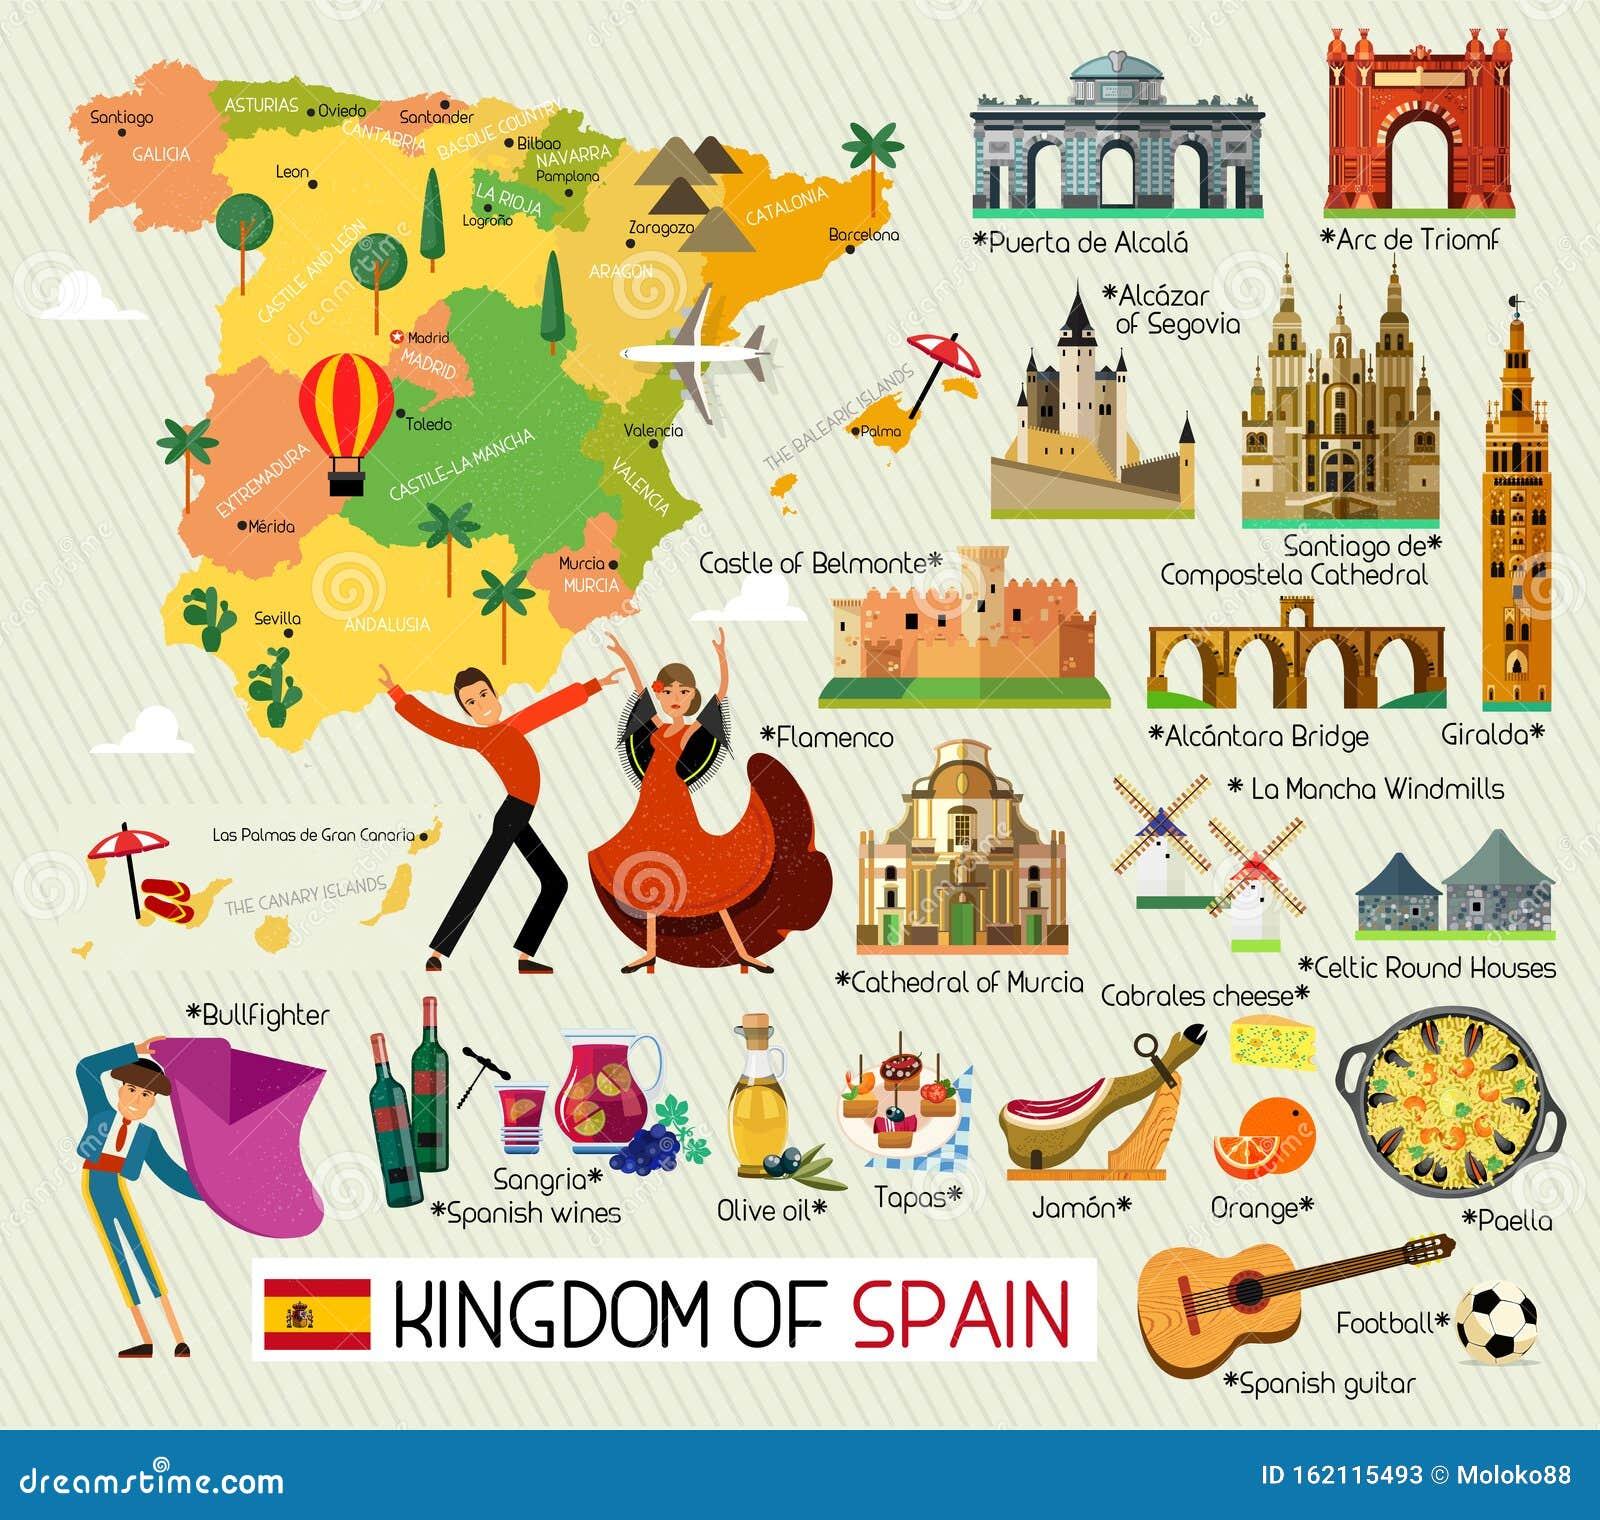 Cartina Turistica Spagna.Spagna Icone Di Viaggio Spagna Cartina Turistica Vettore Illustrazione Vettoriale Illustrazione Di Ballo Alimento 162115493